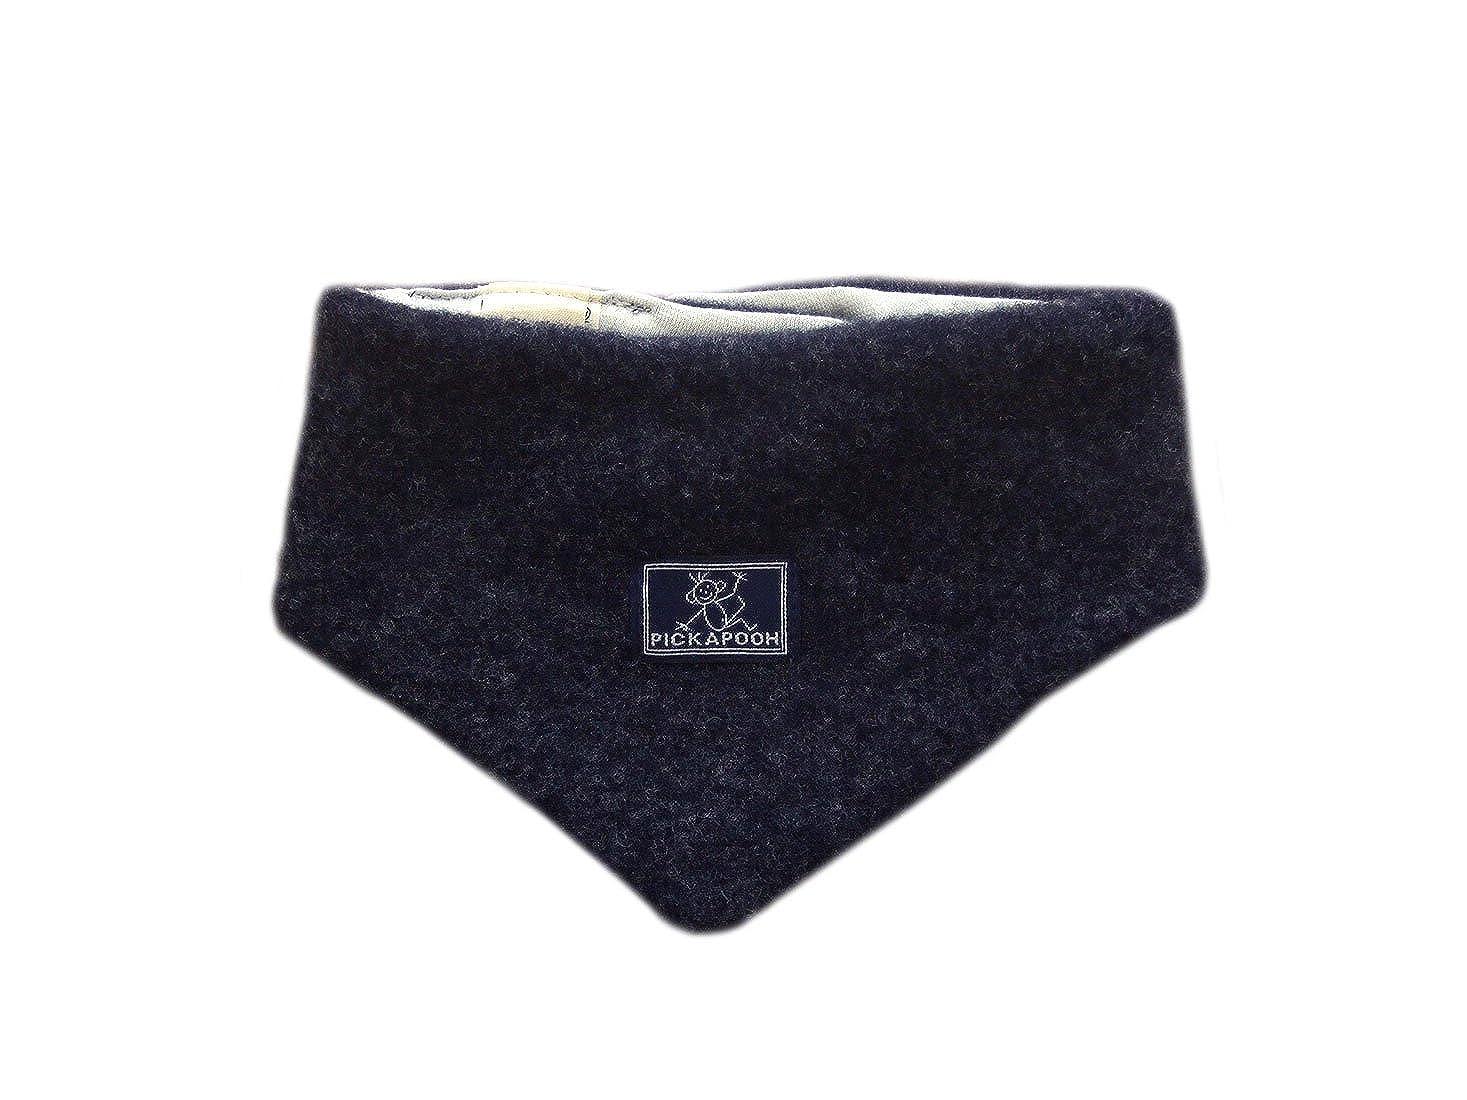 PICKAPOOH Neck warmer 100/% MERINO wool Baby Boy Girl scarf neckerchief cotton fleece winter